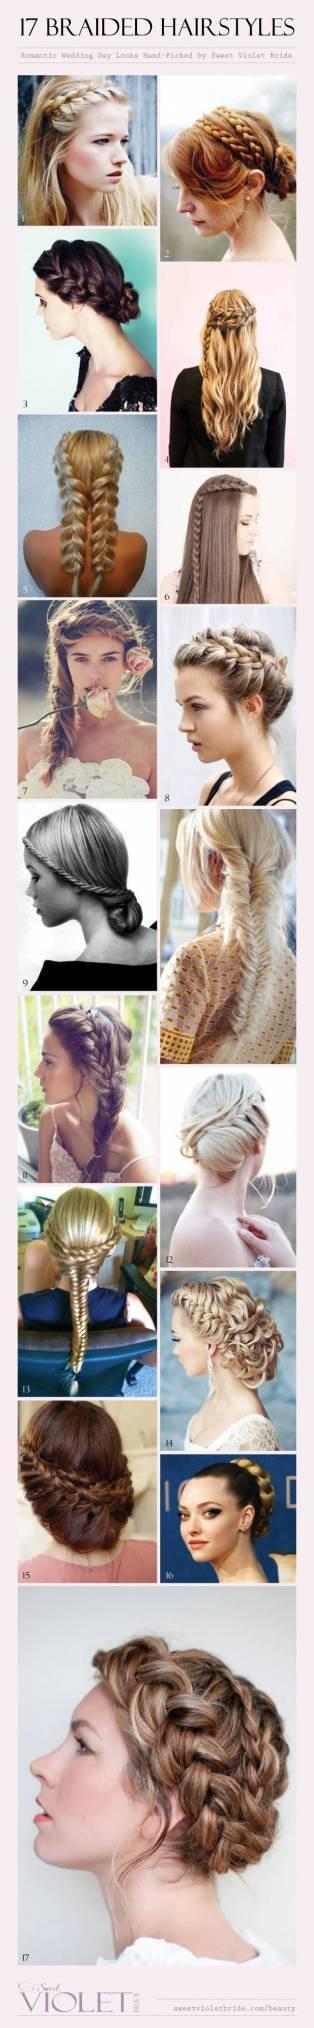 17 Braided Bridal Hairstyles